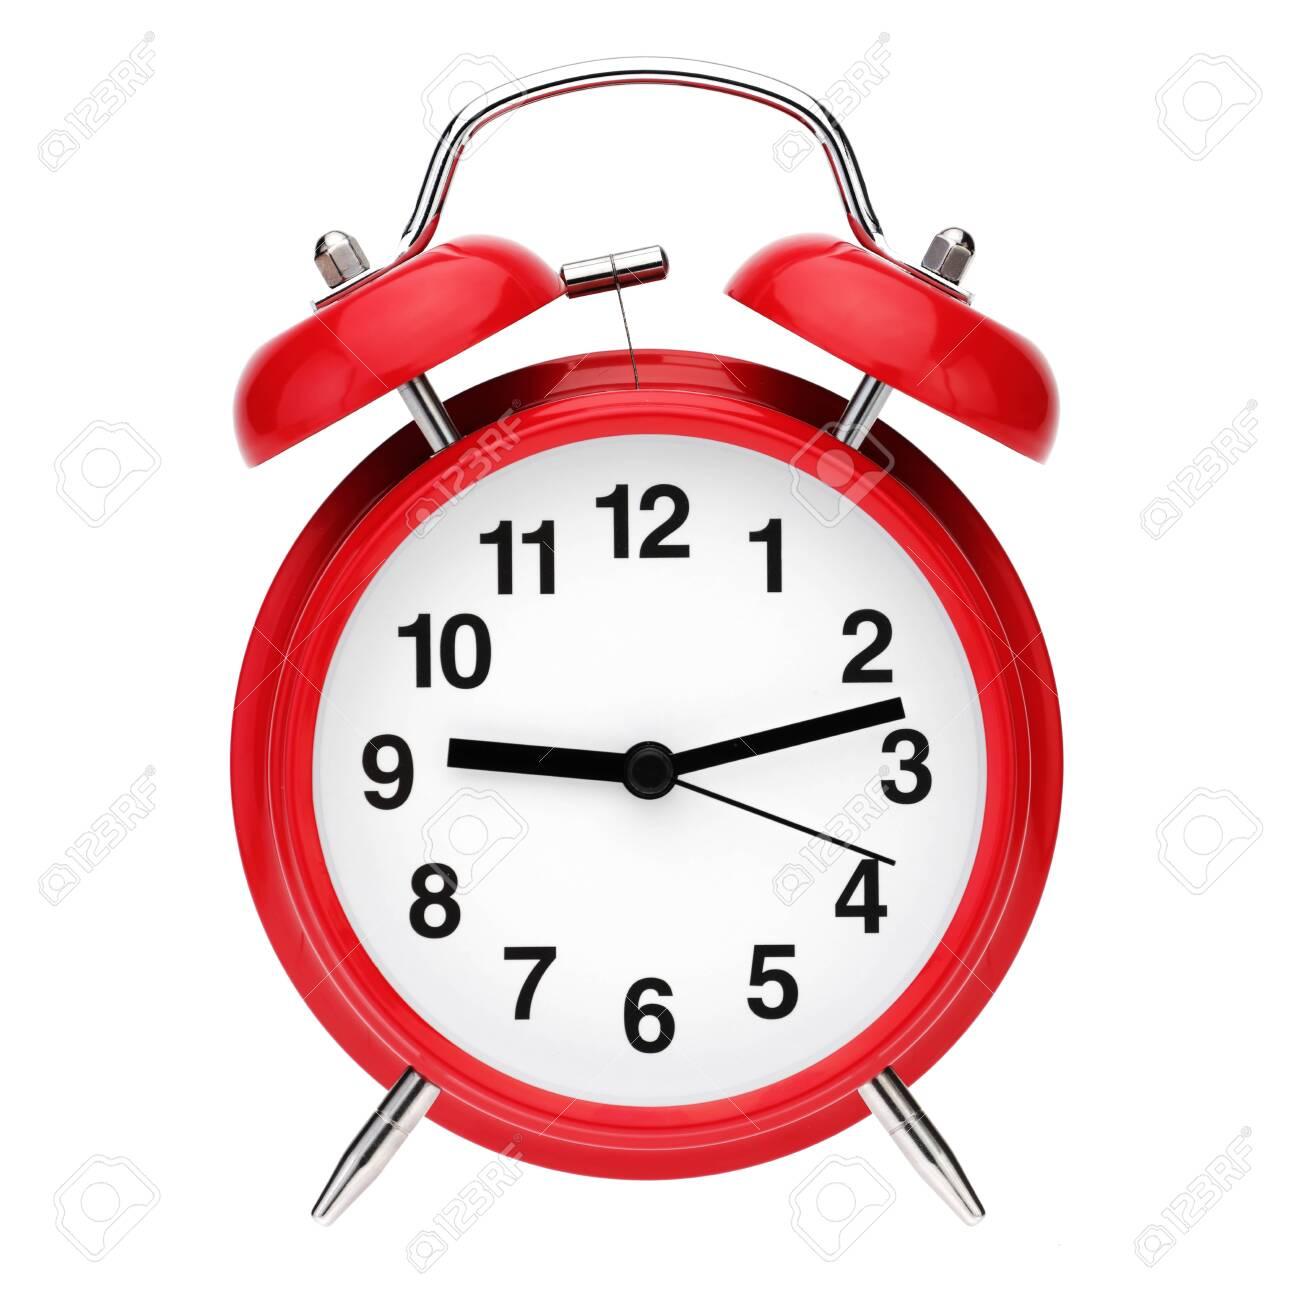 Red retro alarm clock isolated on white background - 131019754